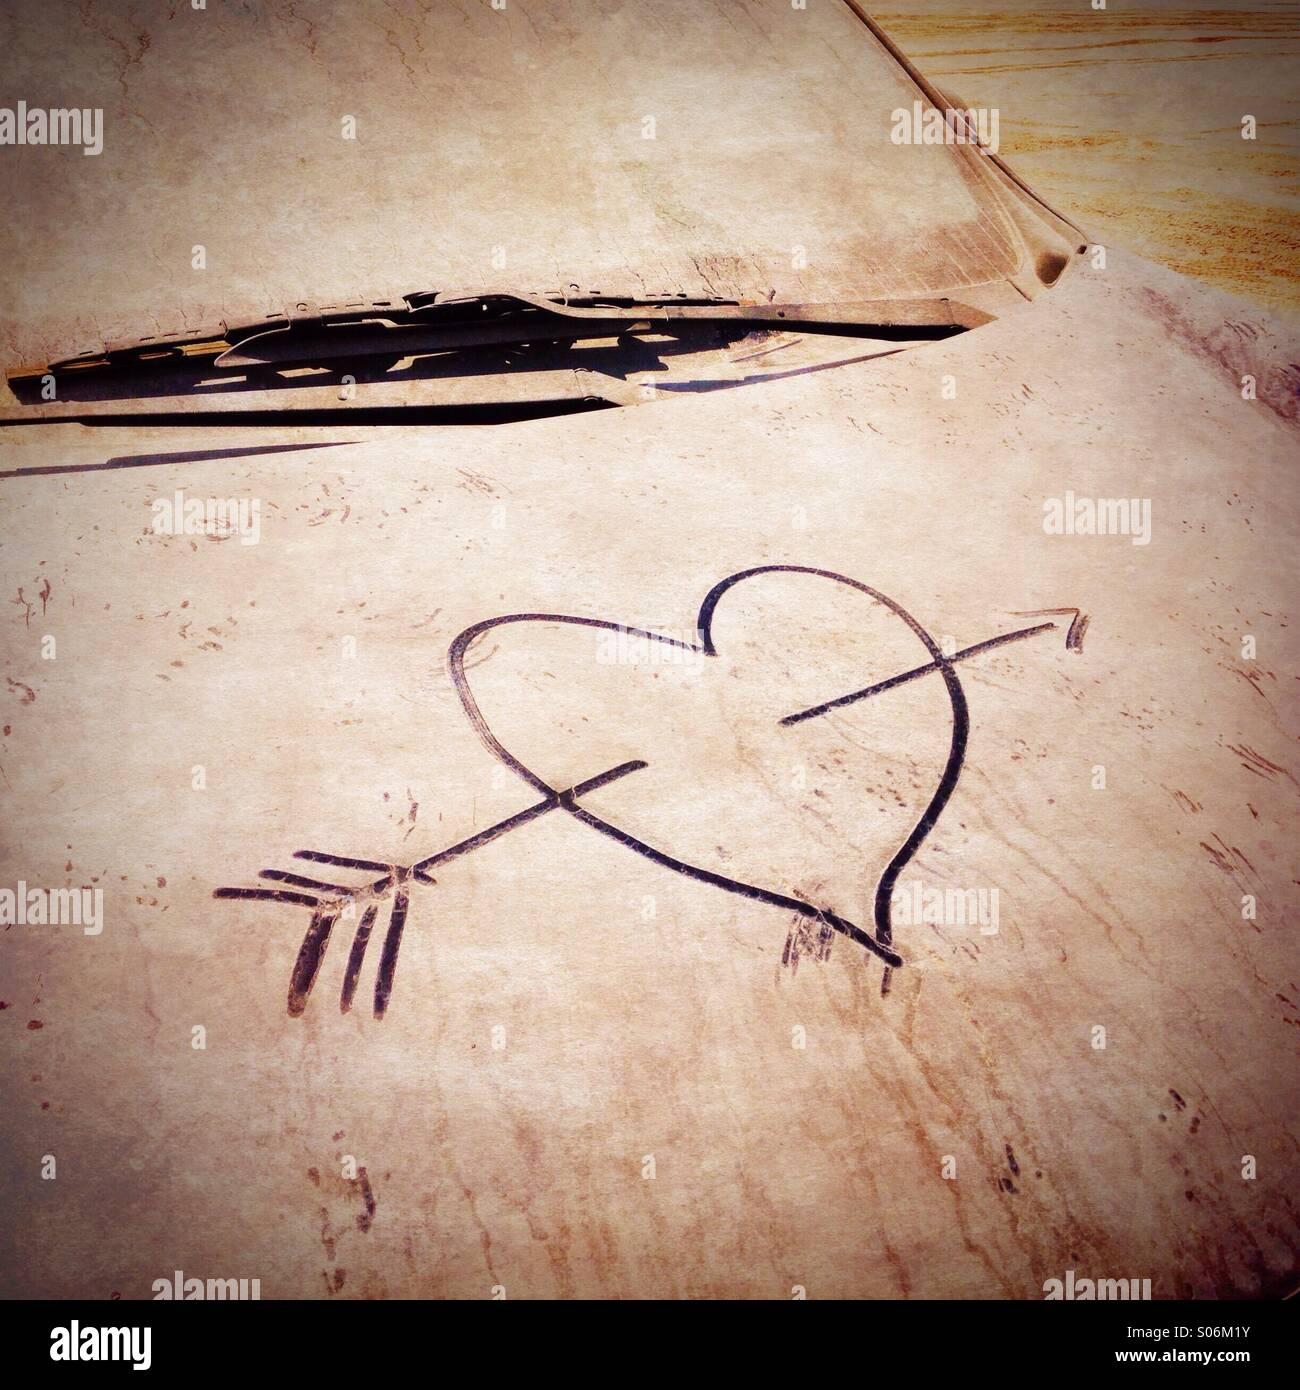 Amor corazón dibujados en sucio automóvil abandonado cubierto de arena en parking en Dubai, Emiratos Árabes Imagen De Stock